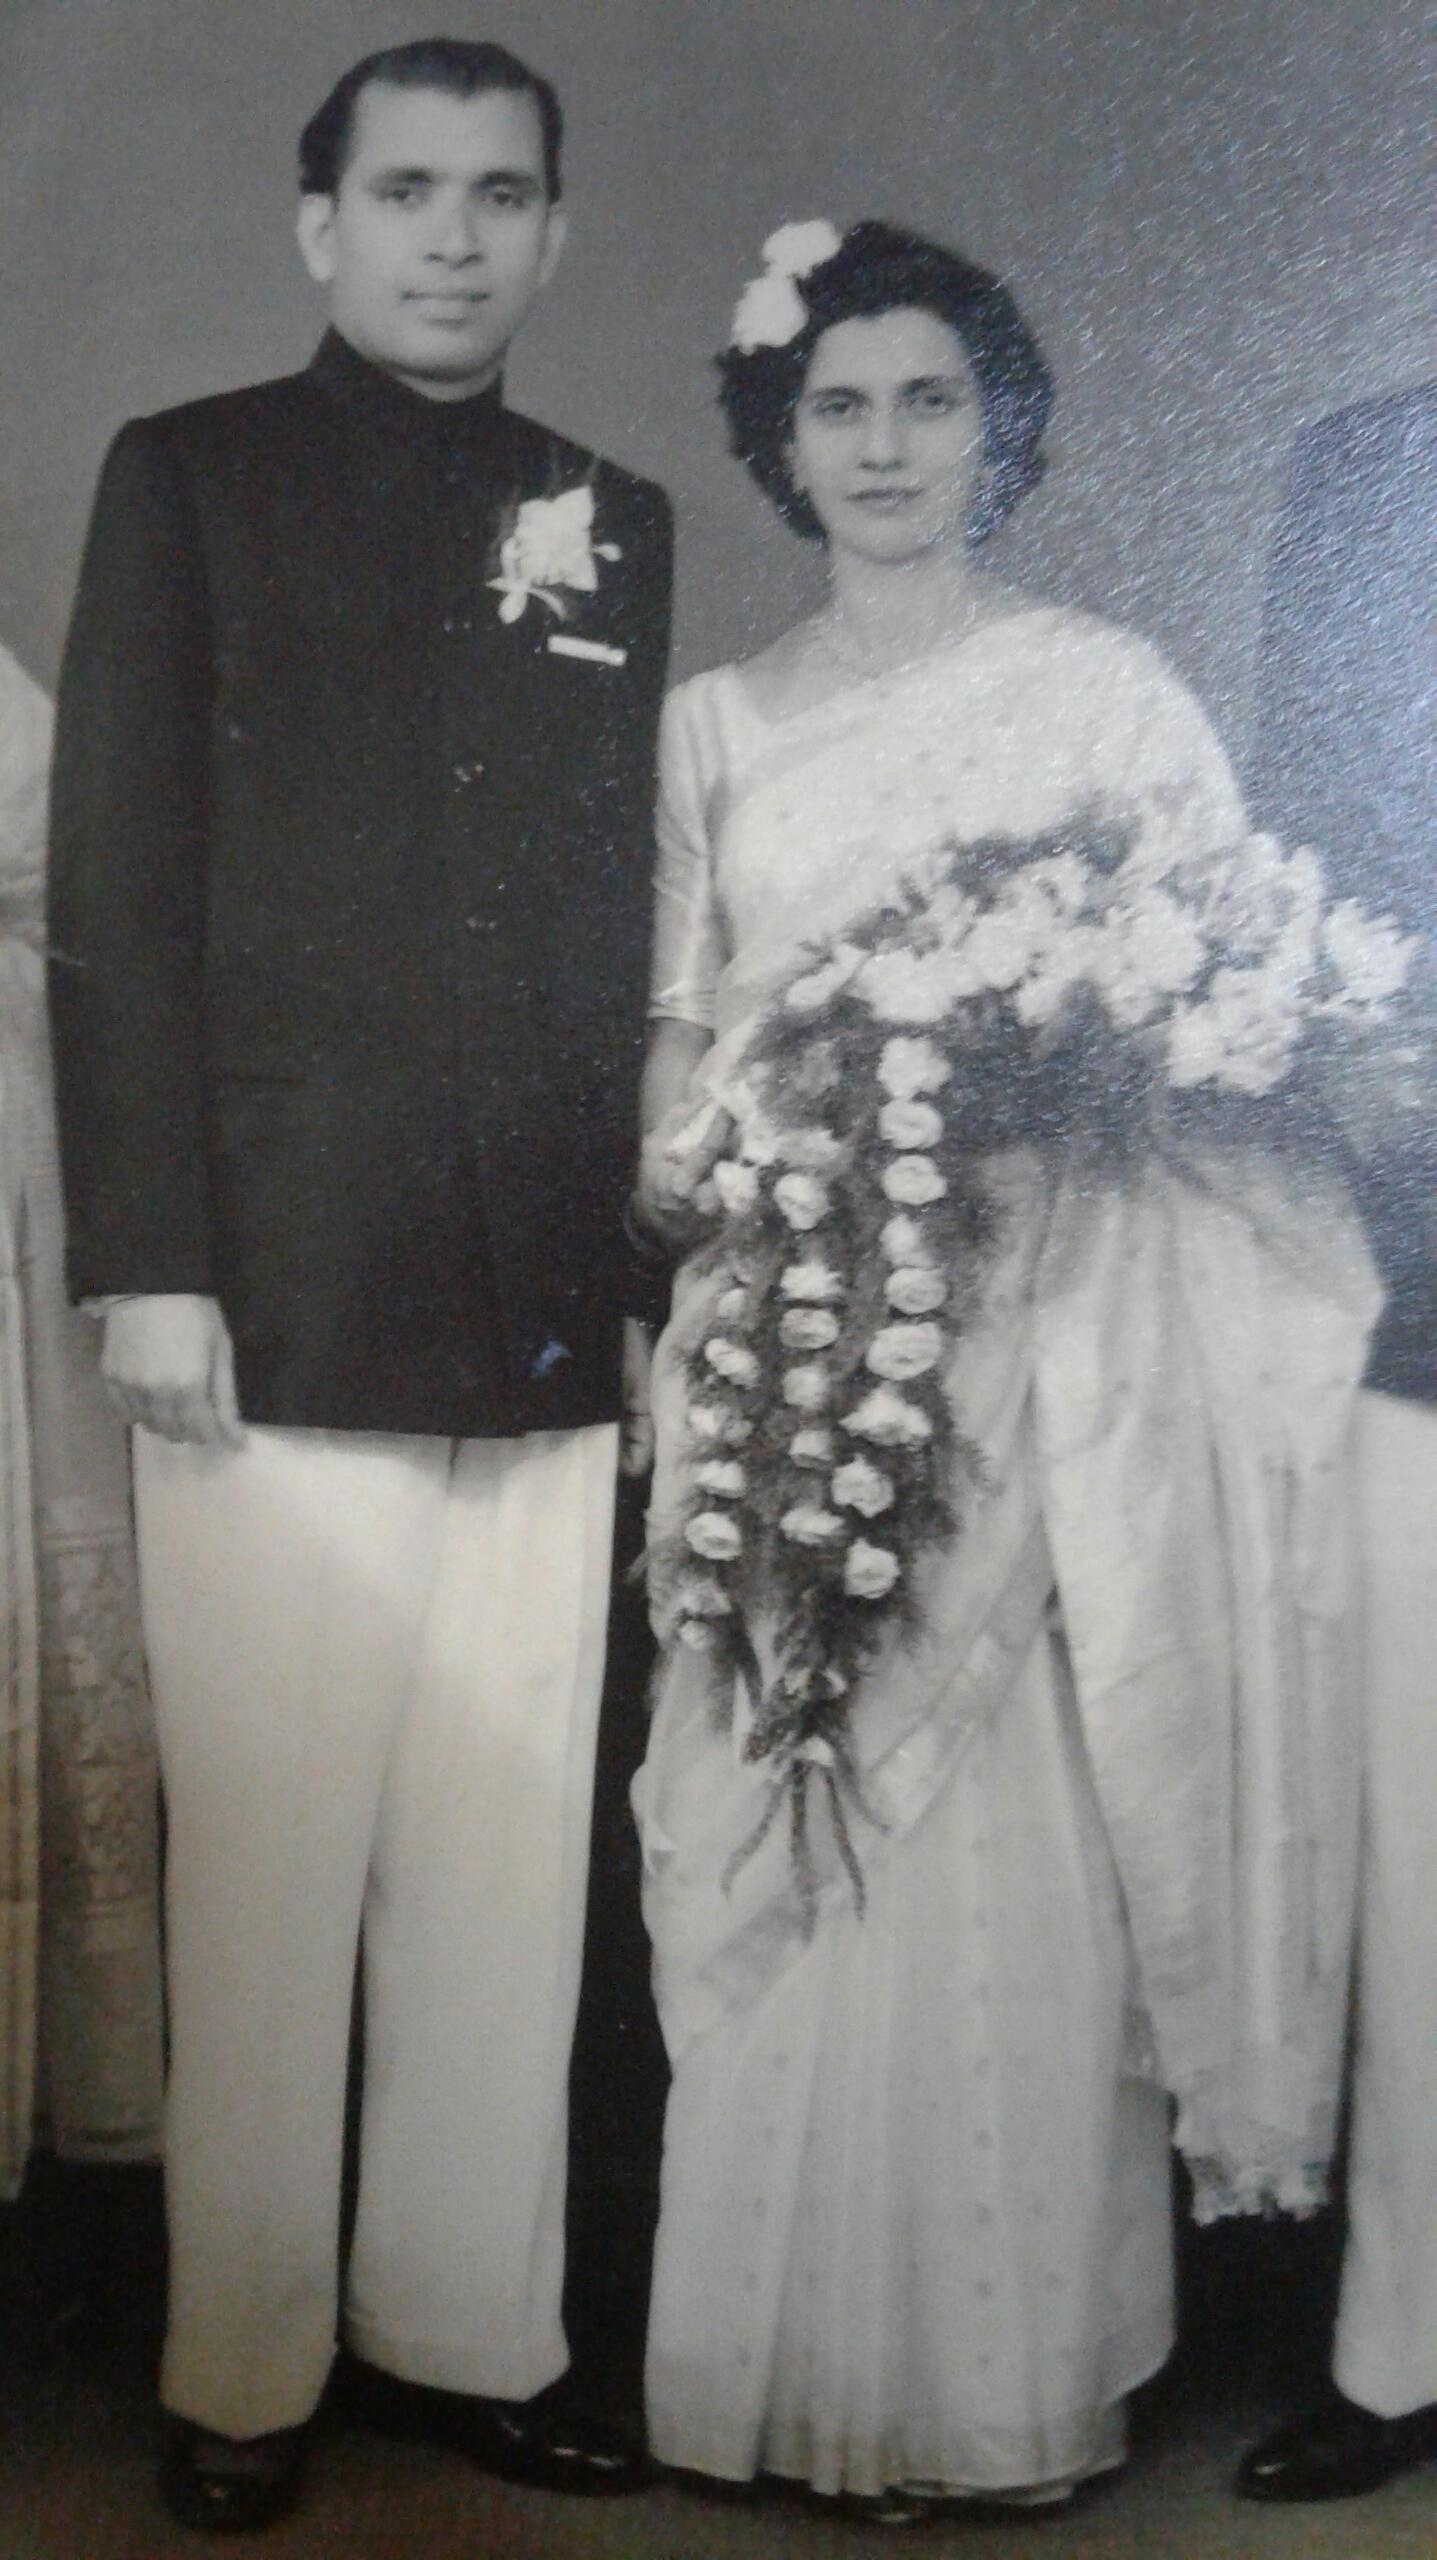 Sarto Esteves and Blanche Dantas on their wedding day, 9 April, 1961. Bombay, India.